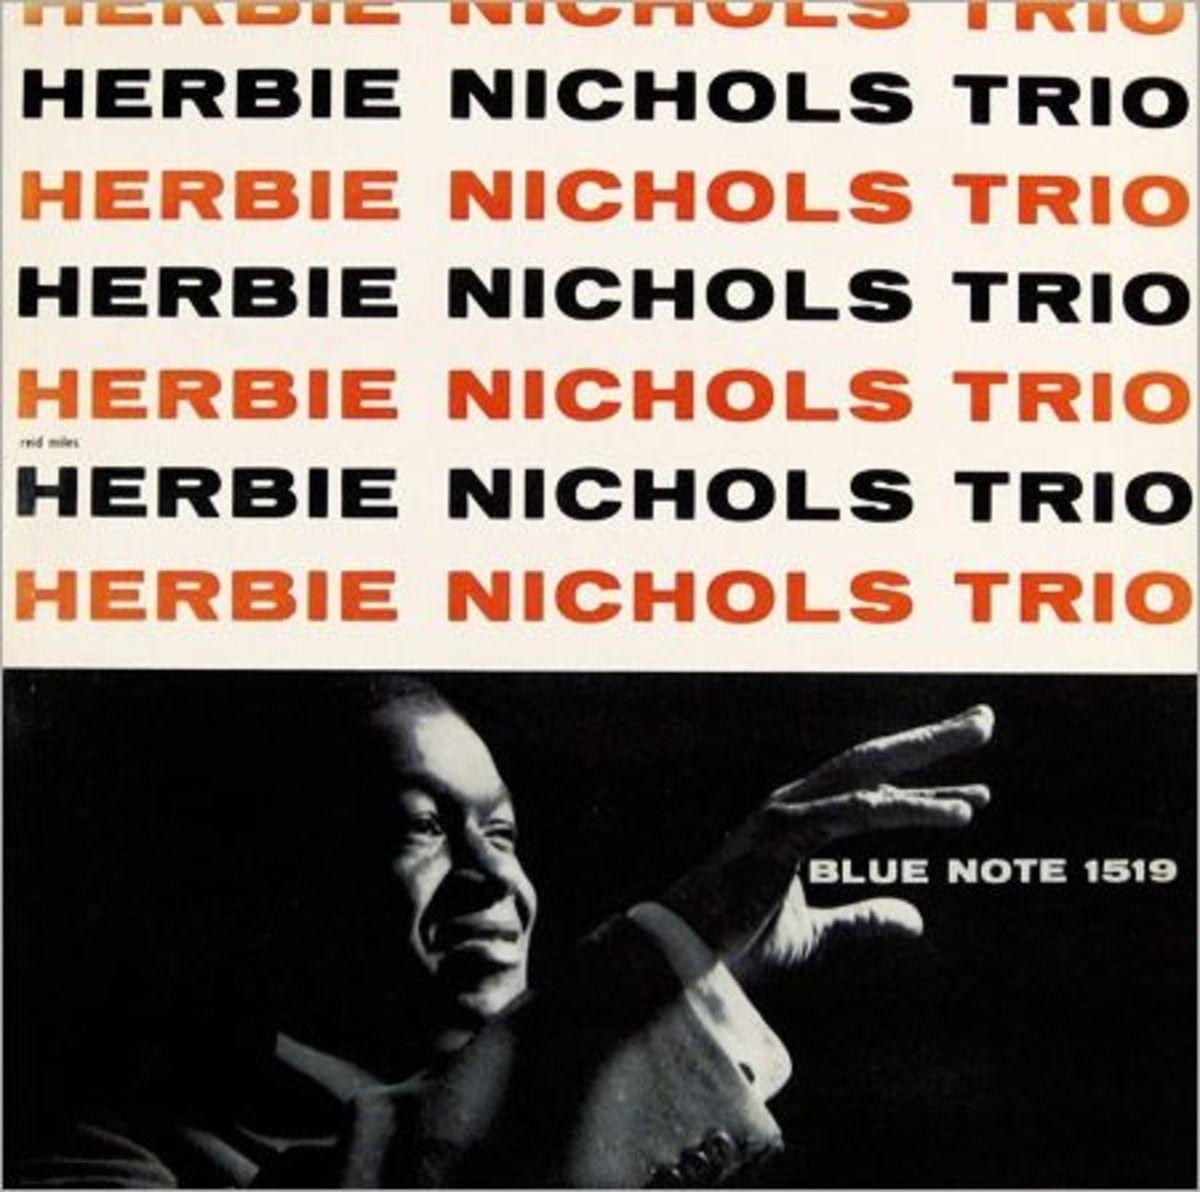 "Herbie Nichols Trio Blue Note Records BLP 1519 12"" LP Vinyl Record (1956) Album Cover Design by Reid Miles, Photo by Francis Wolff"